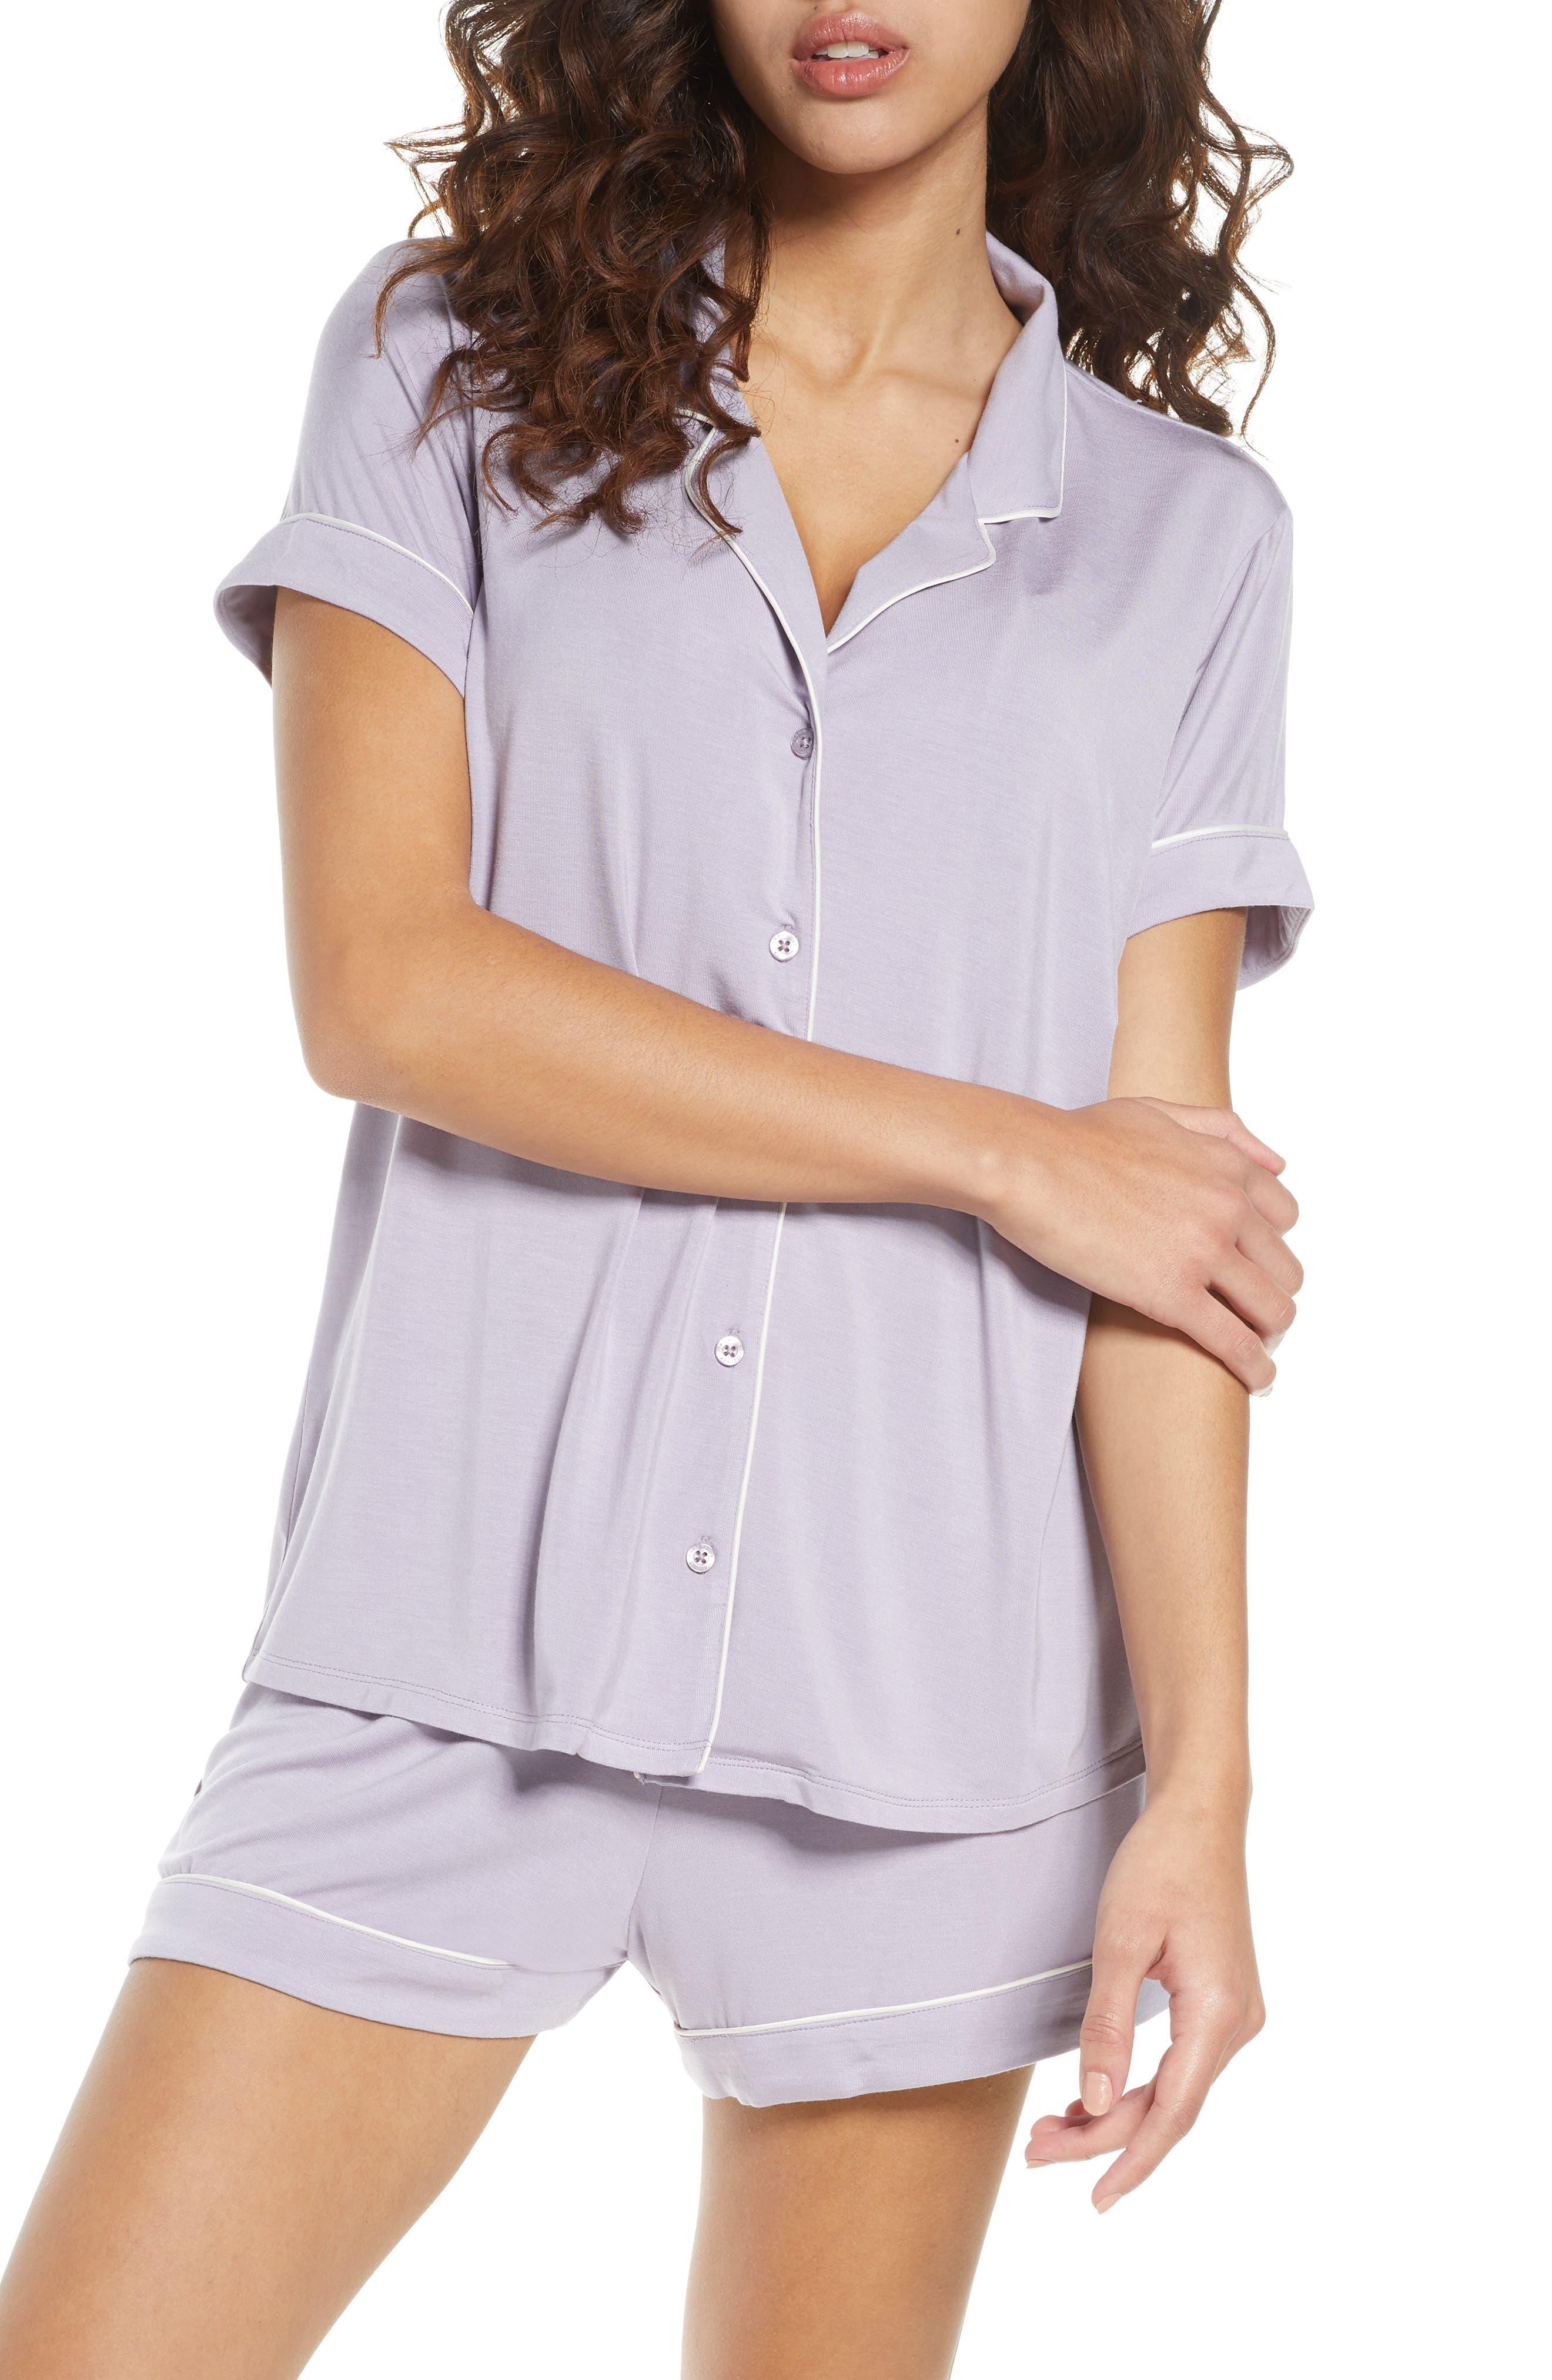 Love Loungewear Juniors I Love You Blush Shorty Valentines Pajamas 100/% Cotton